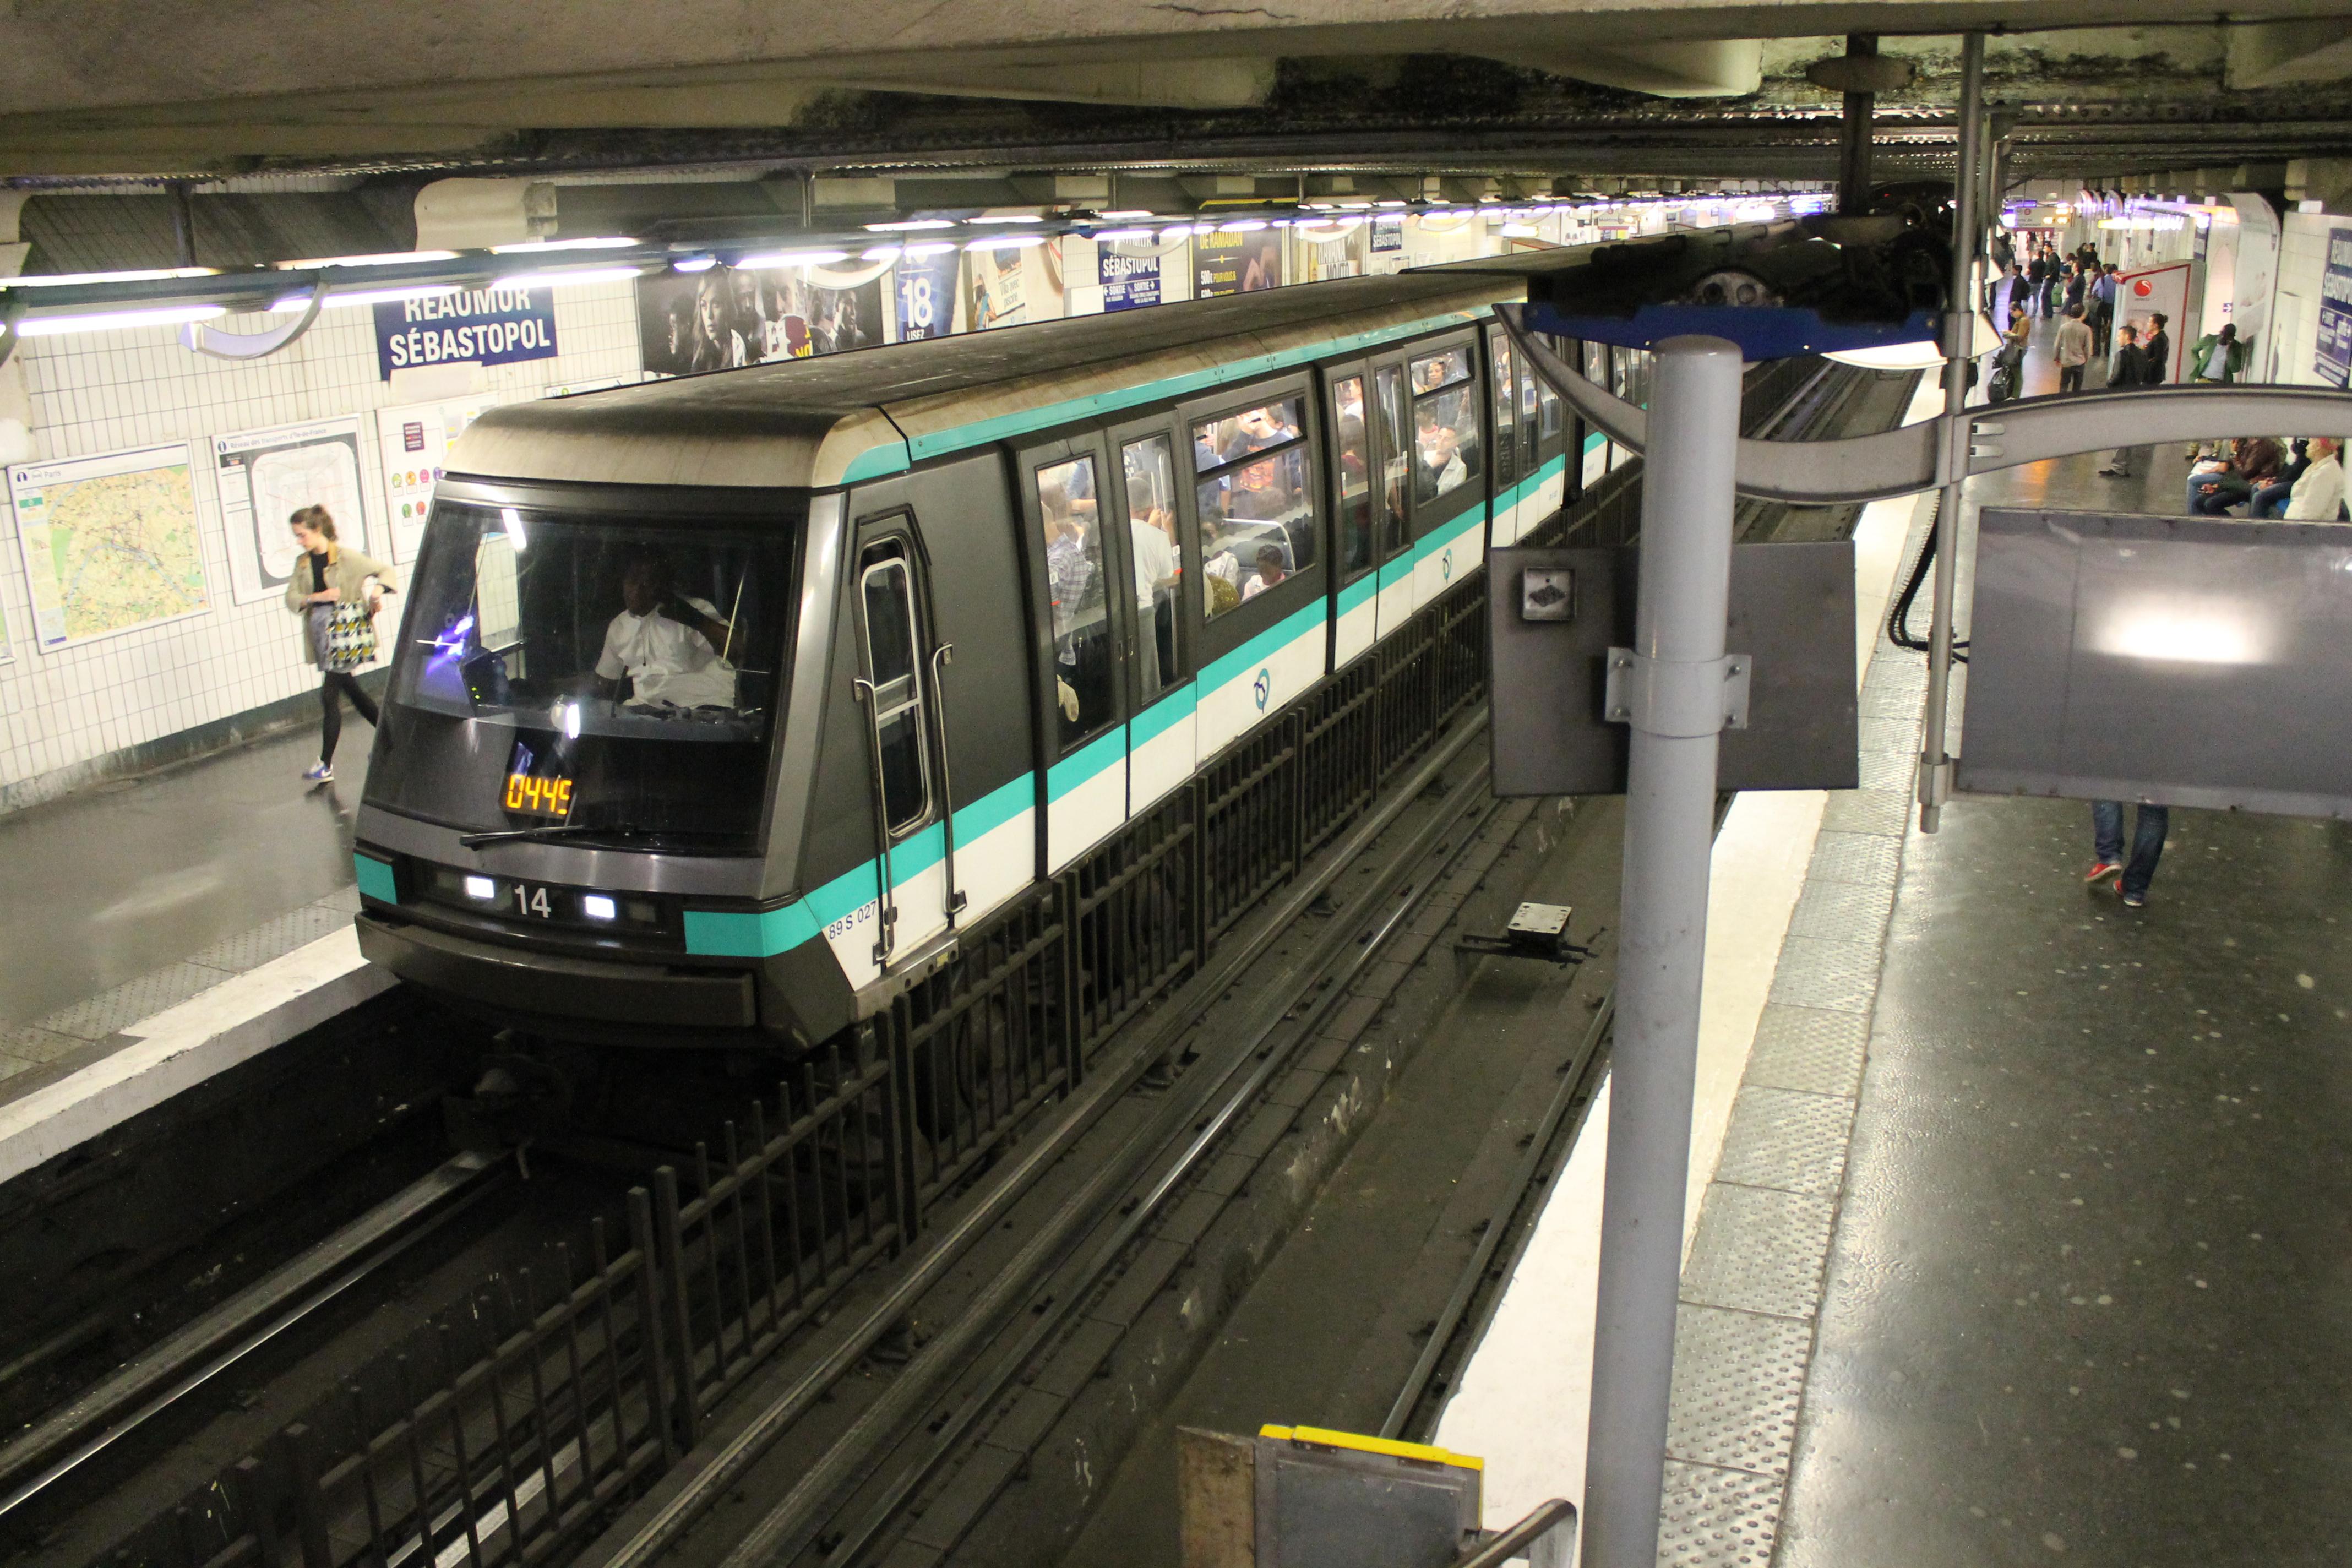 R%C3%A9aumur_-_S%C3%A9bastopol_Metro%2C_Paris_July_2014.jpg